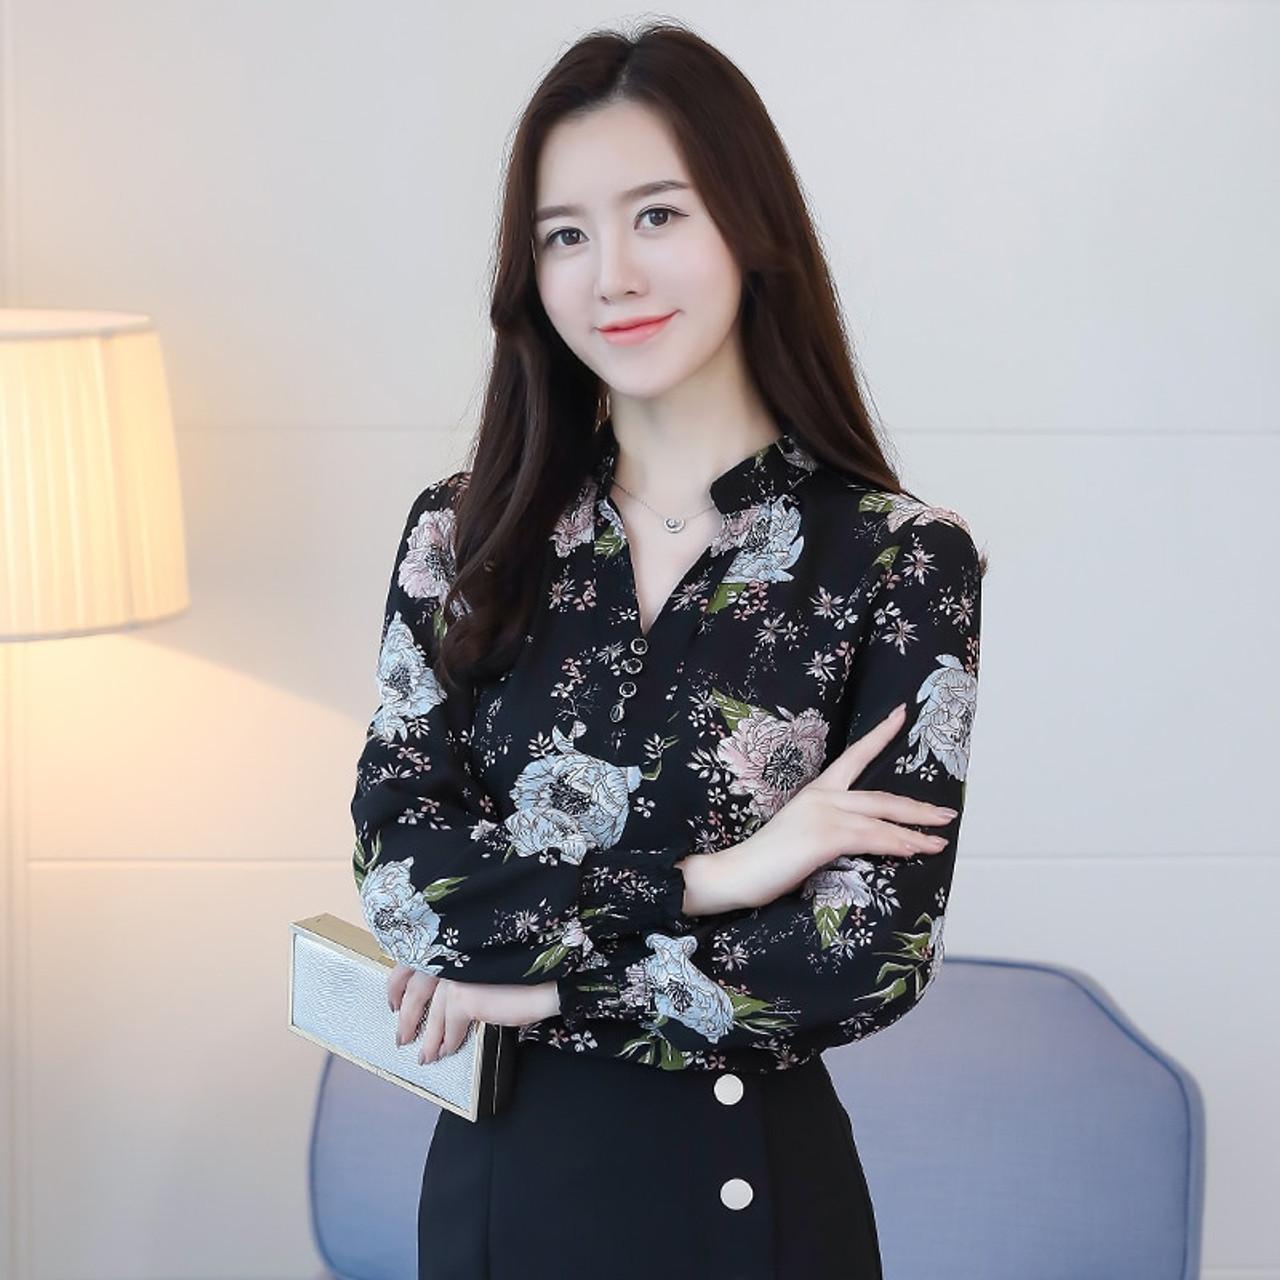 7f33fa70 ... 2018 new spring long sleeved blouses fashion slim casual print plus  size elegant OL style women ...